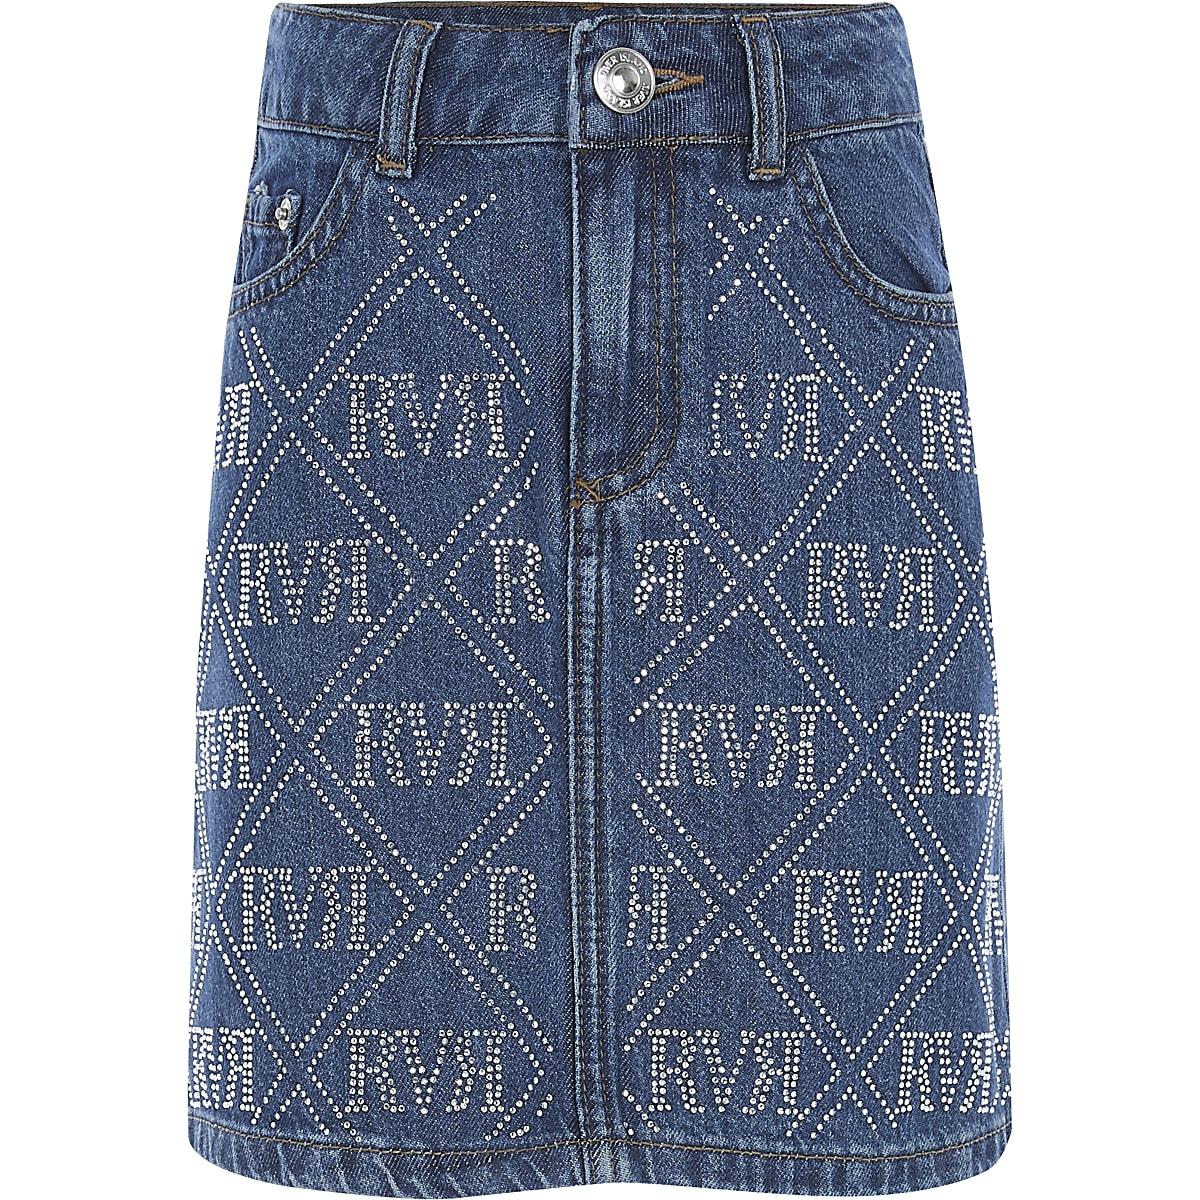 Girls blue RI diamante denim skirt